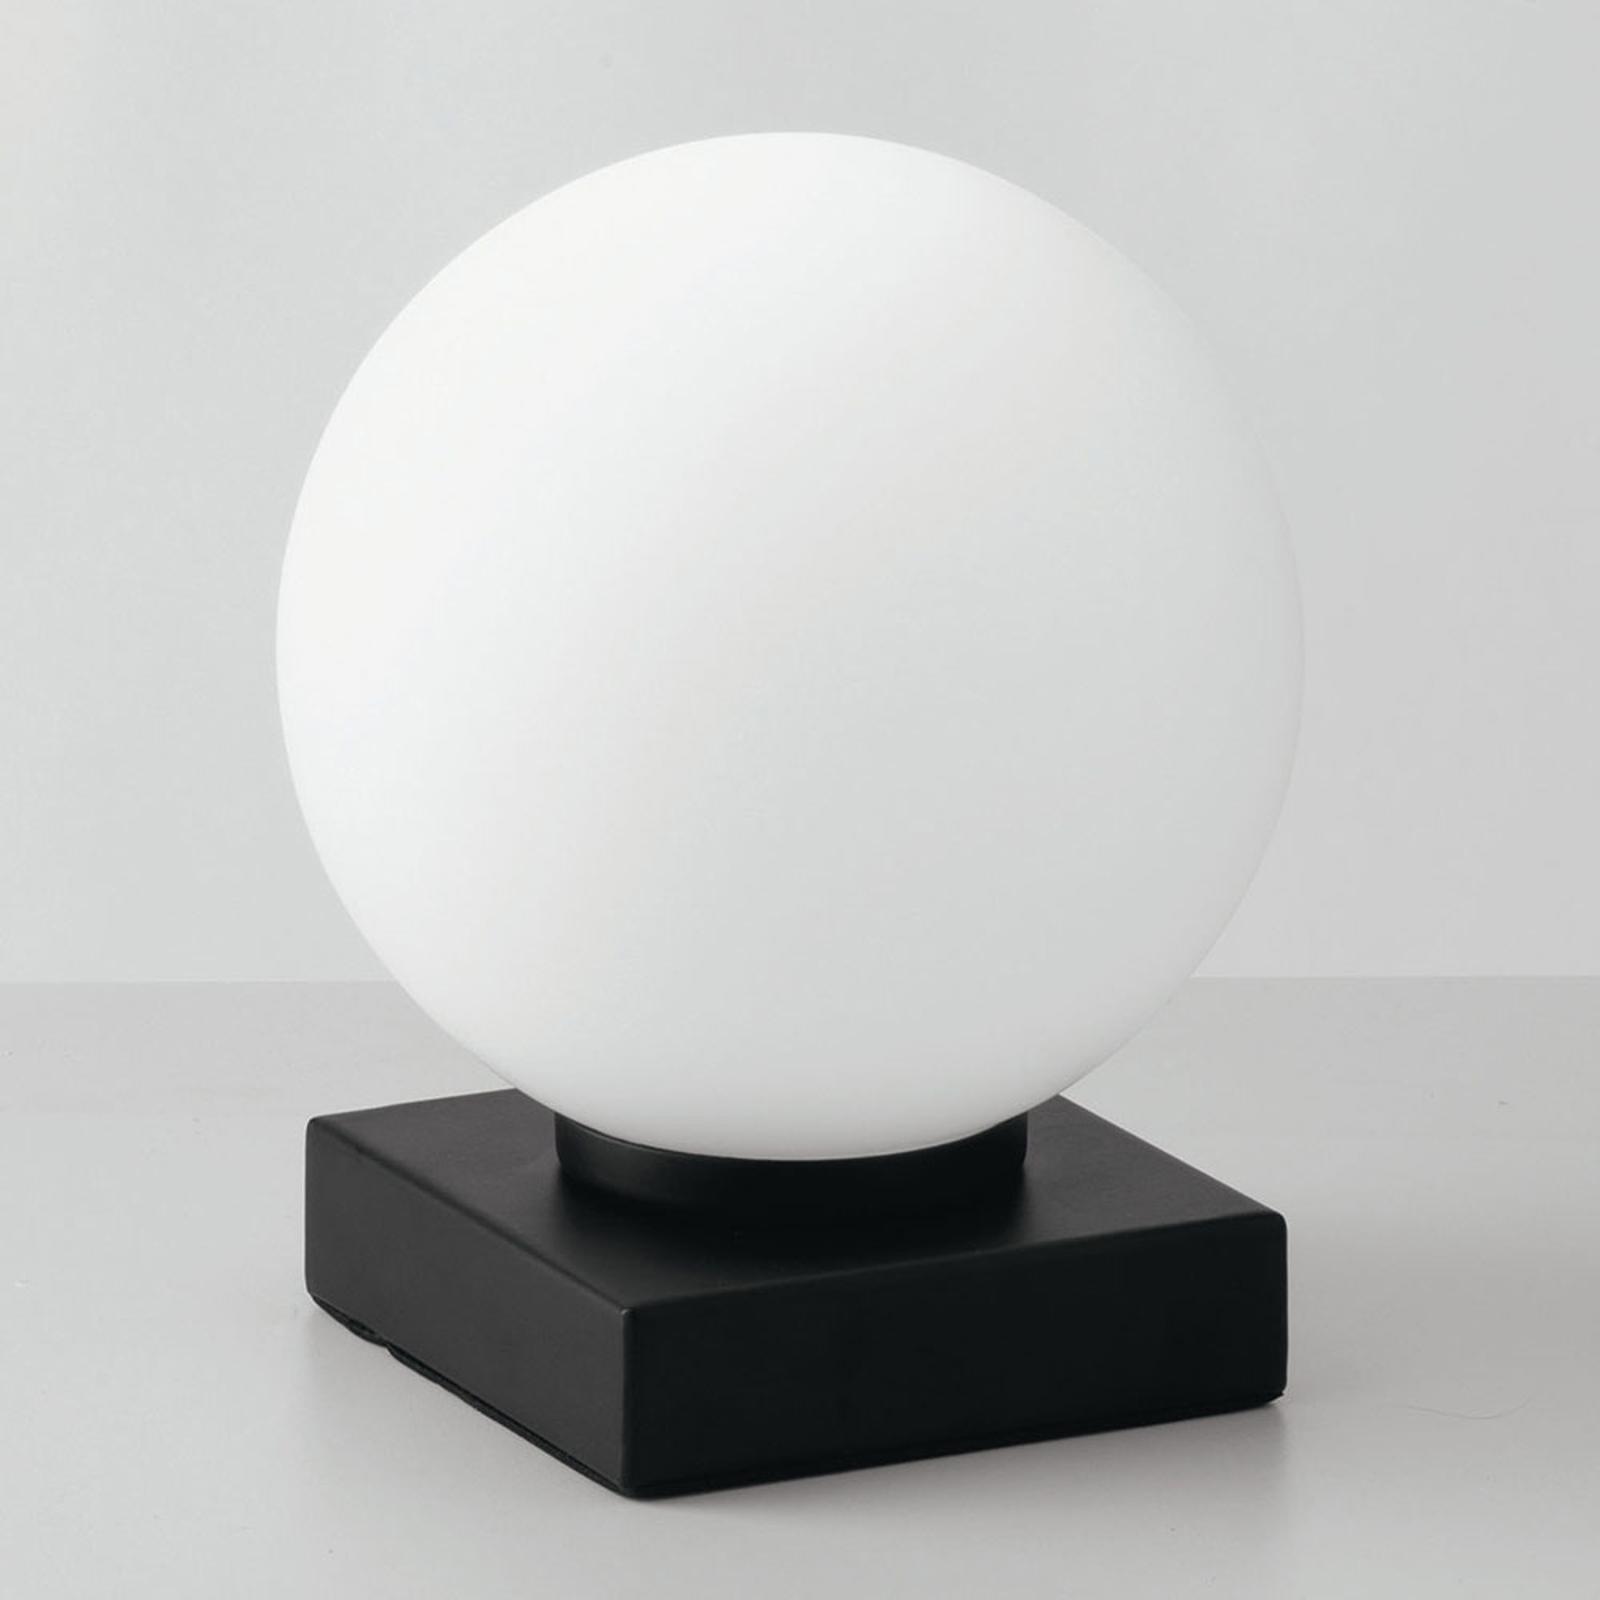 Tafellamp Enoire in zwart en wit, 1-lamp